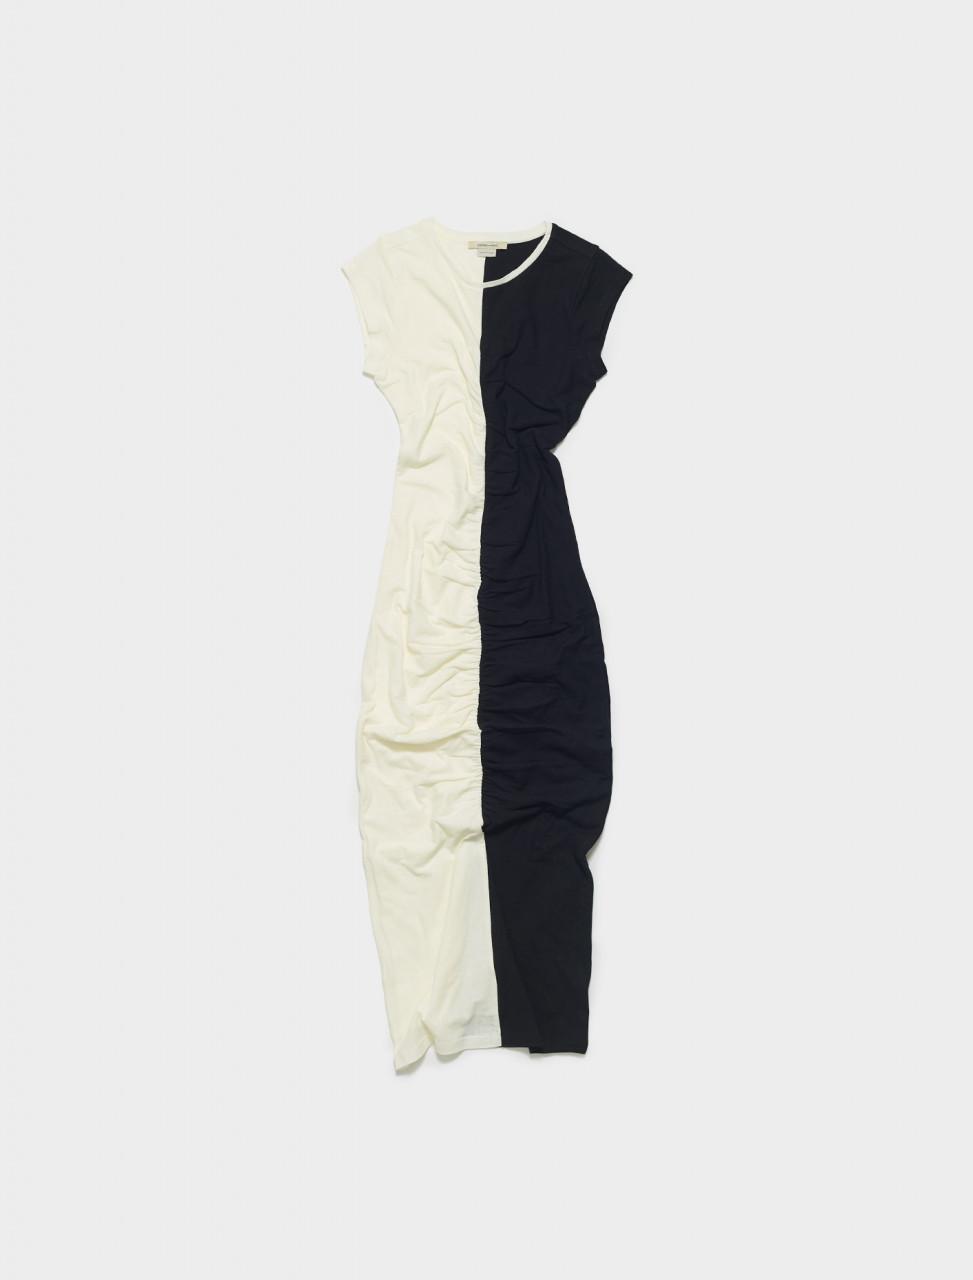 PJM006-999 PALOMA WOOL DOMINO JERSEY DRESS IN BLACK